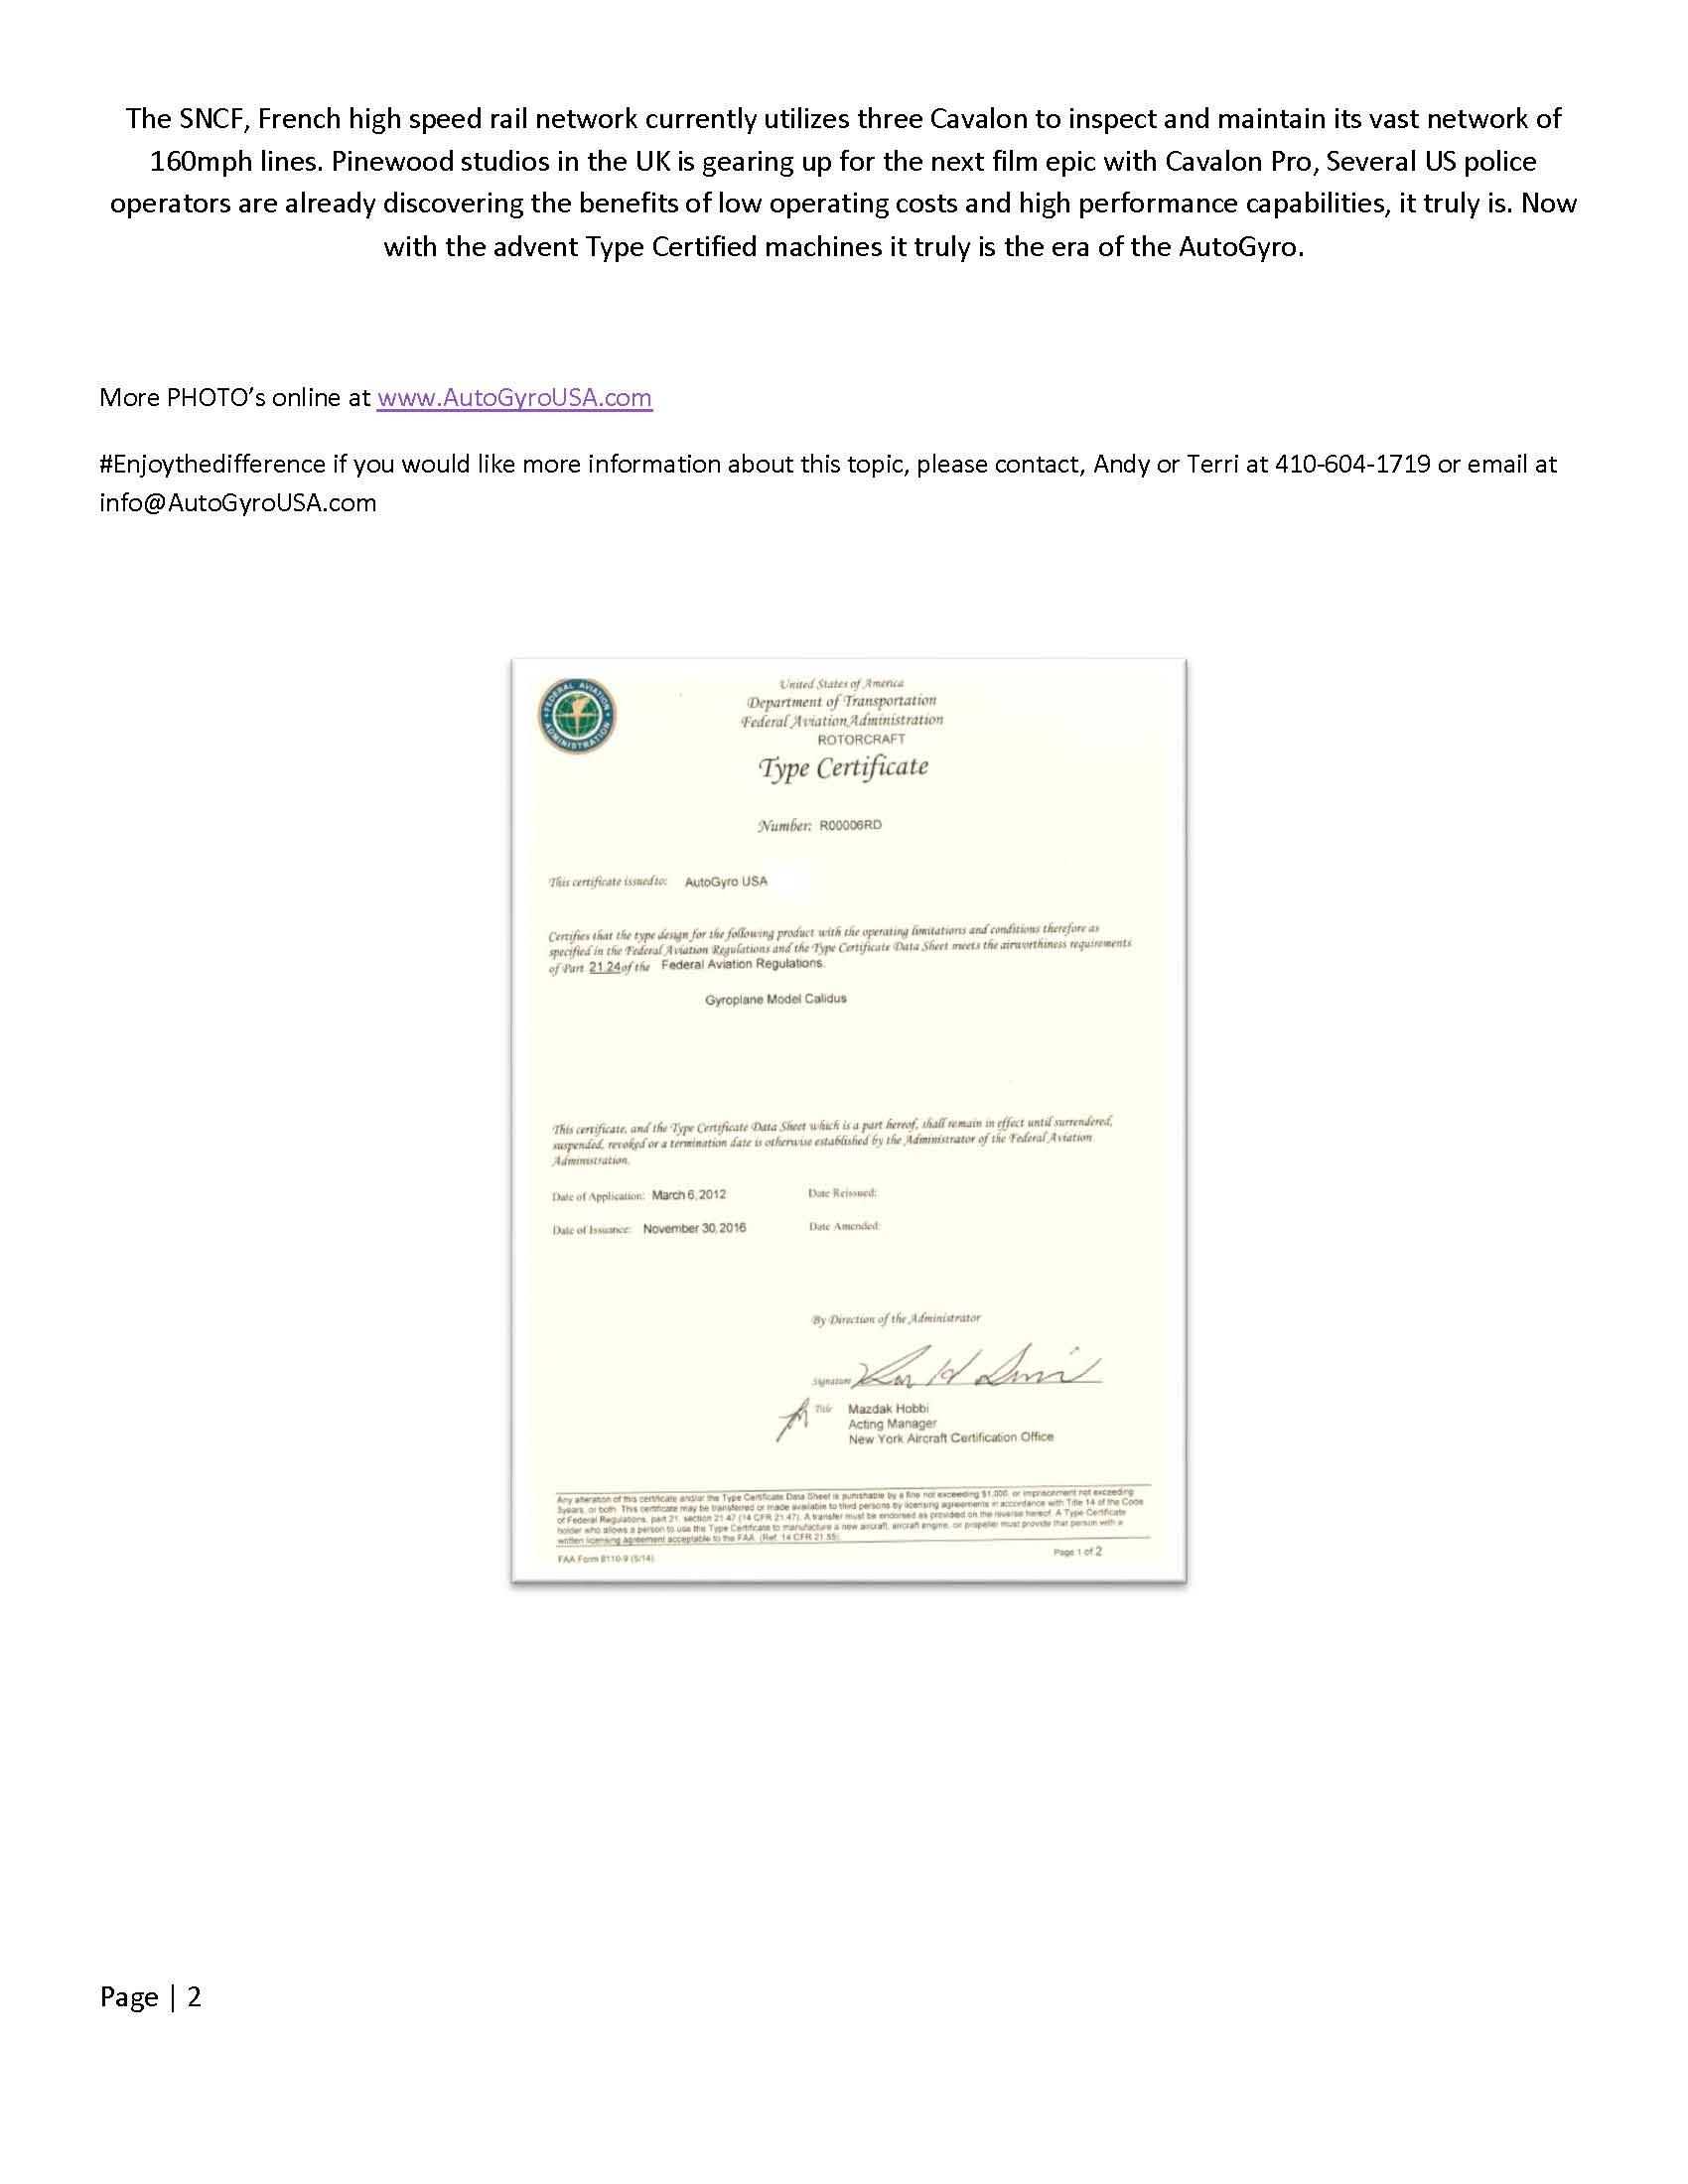 Calidus Type Certificate PR 2 1130 PC_Page_2.jpg